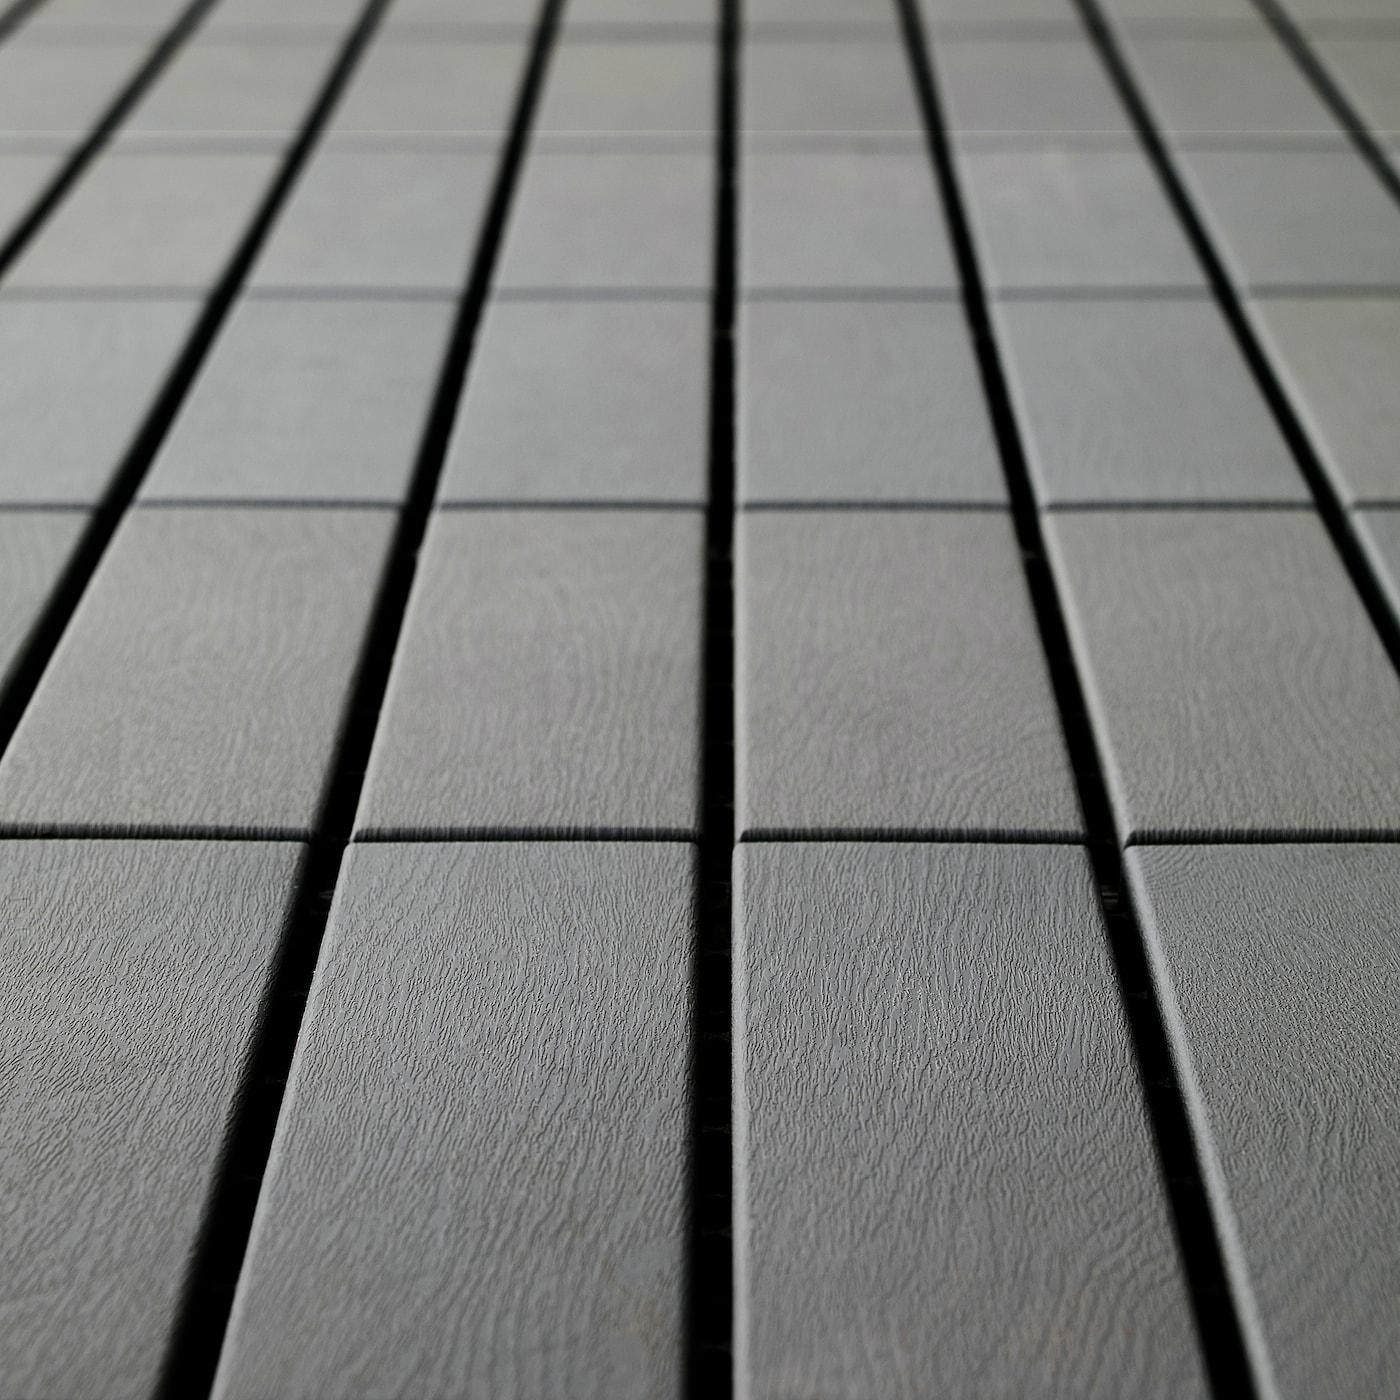 IKEA RUNNEN 9-er Pack Bodenrost grau Balkon Terrasse Bodenbelag Bodenfliesen NEU